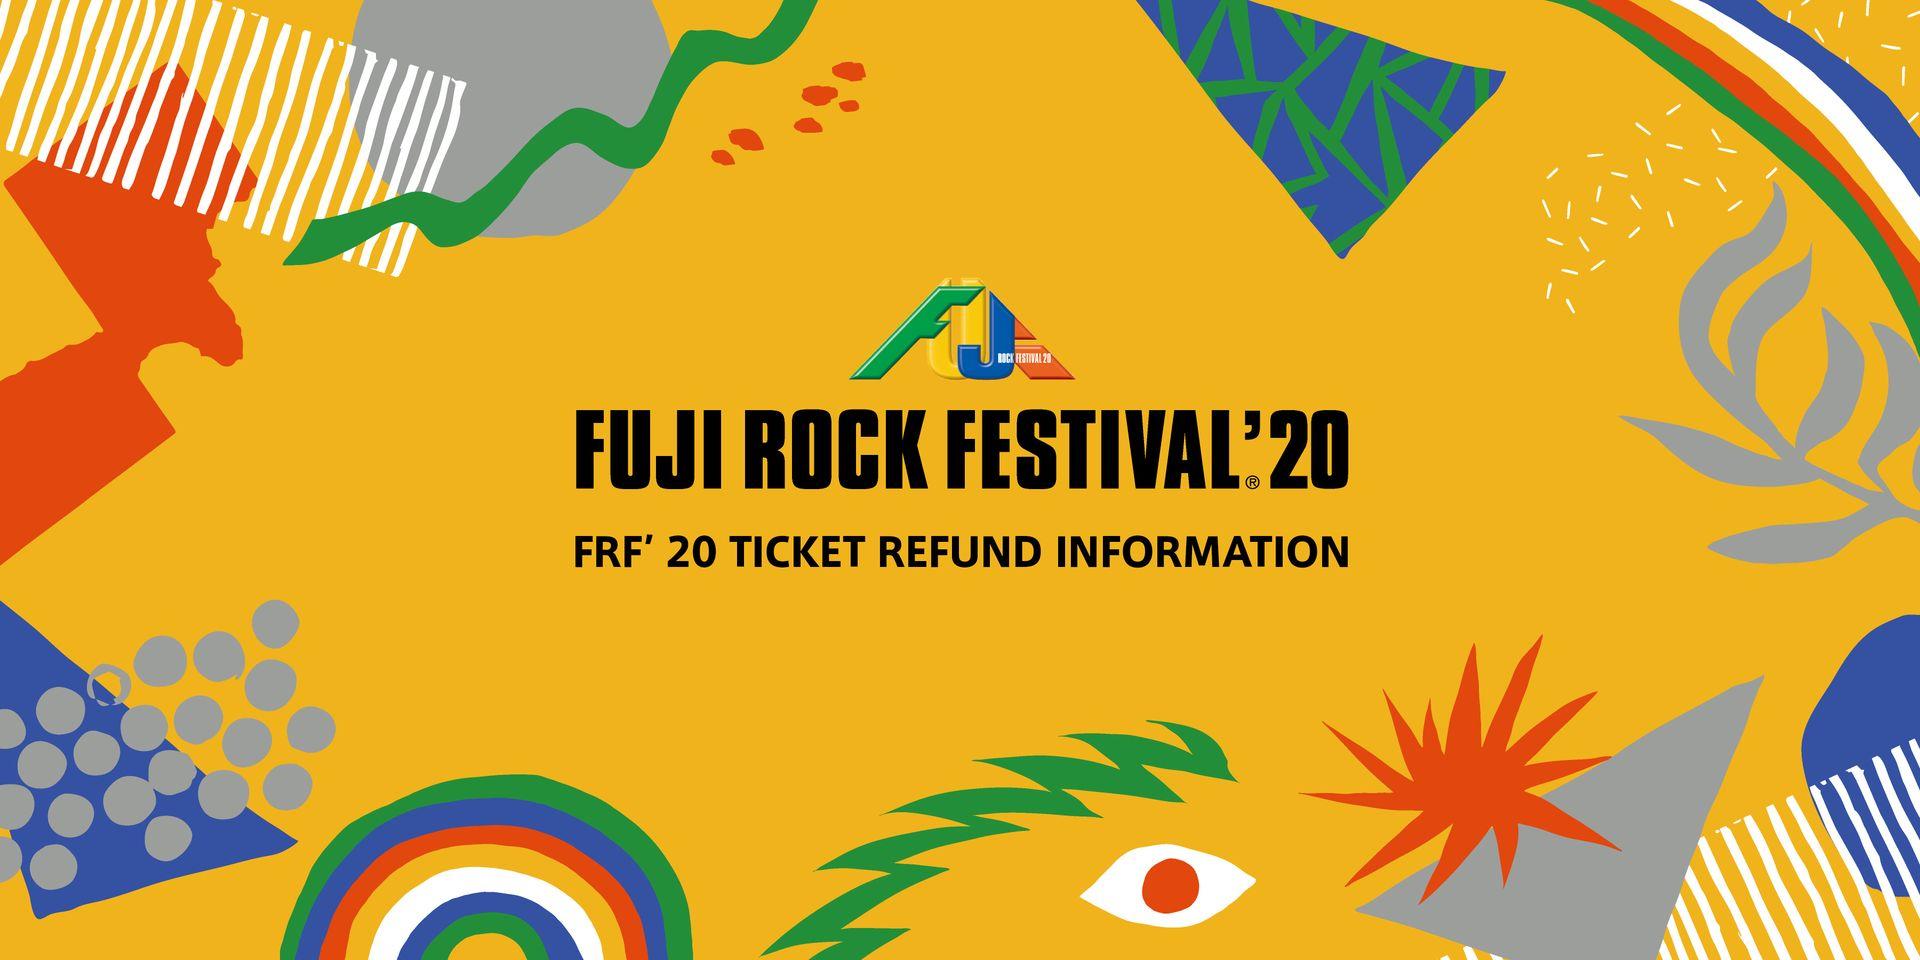 FUJI ROCK FESTIVAL 2020